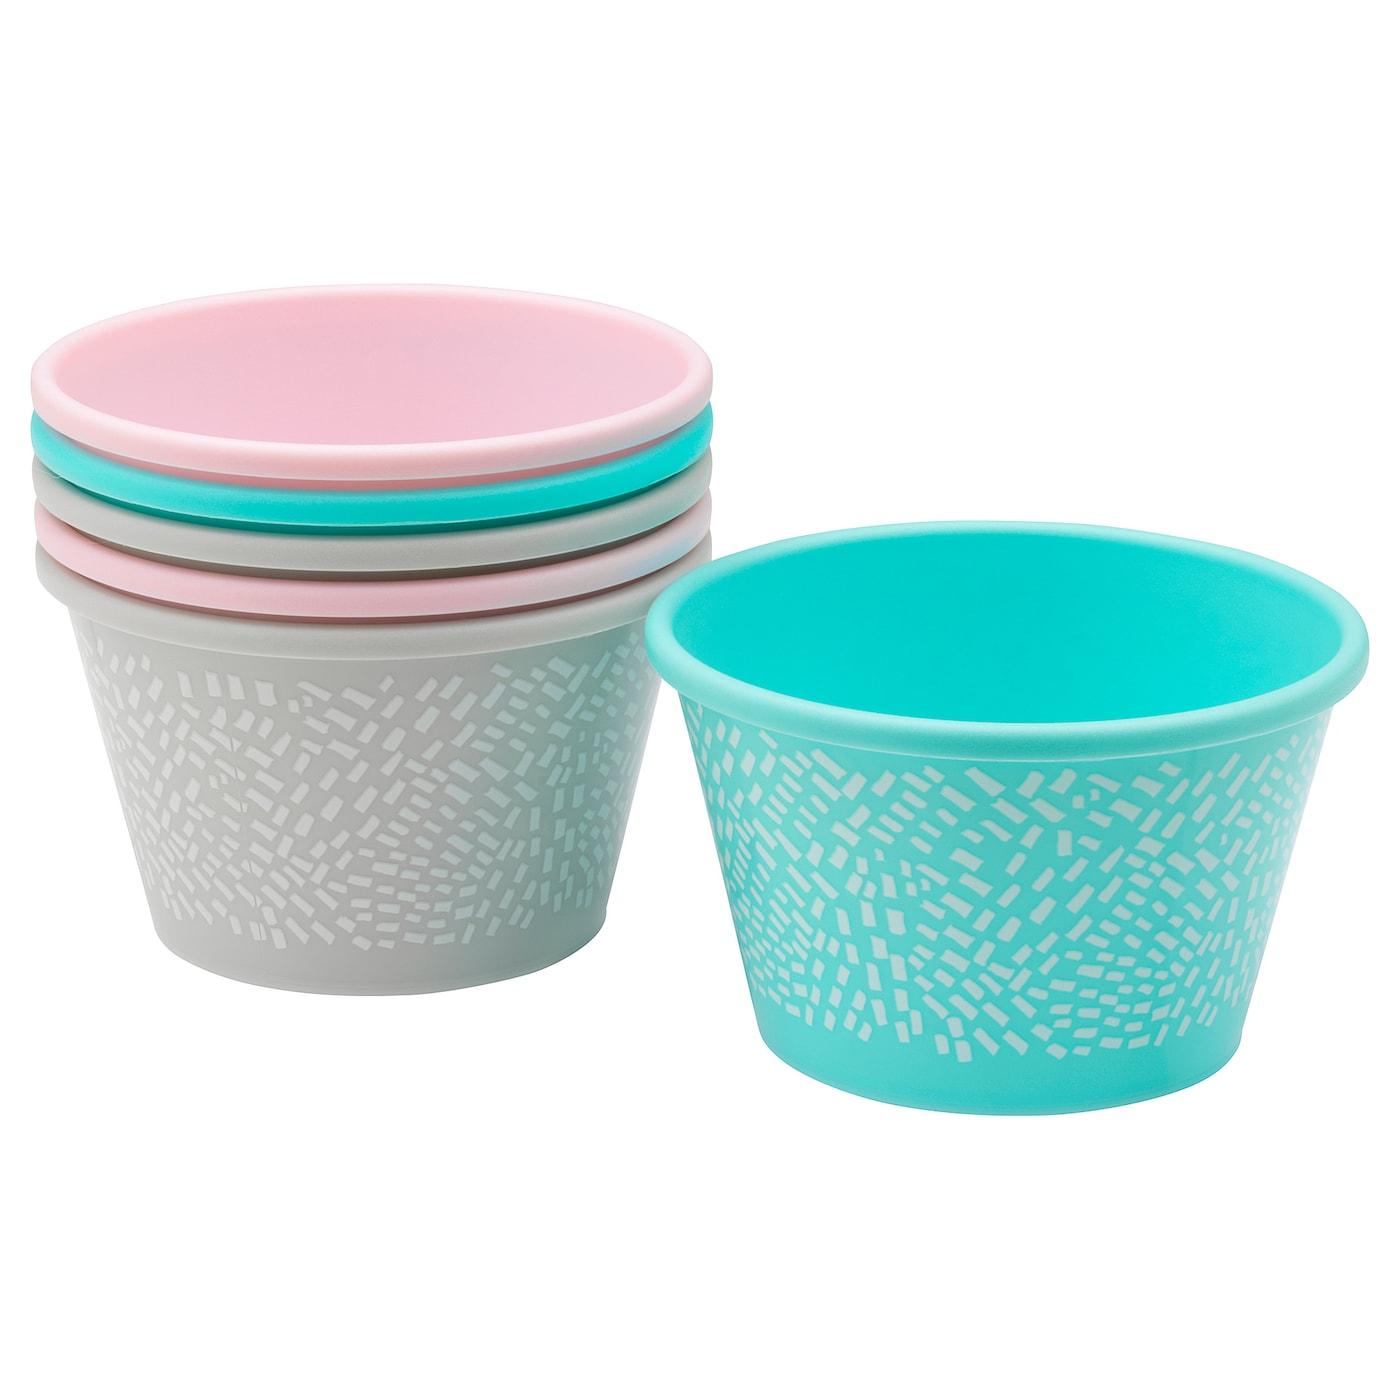 sommar 2018 bowl multicolour 13 cm ikea. Black Bedroom Furniture Sets. Home Design Ideas